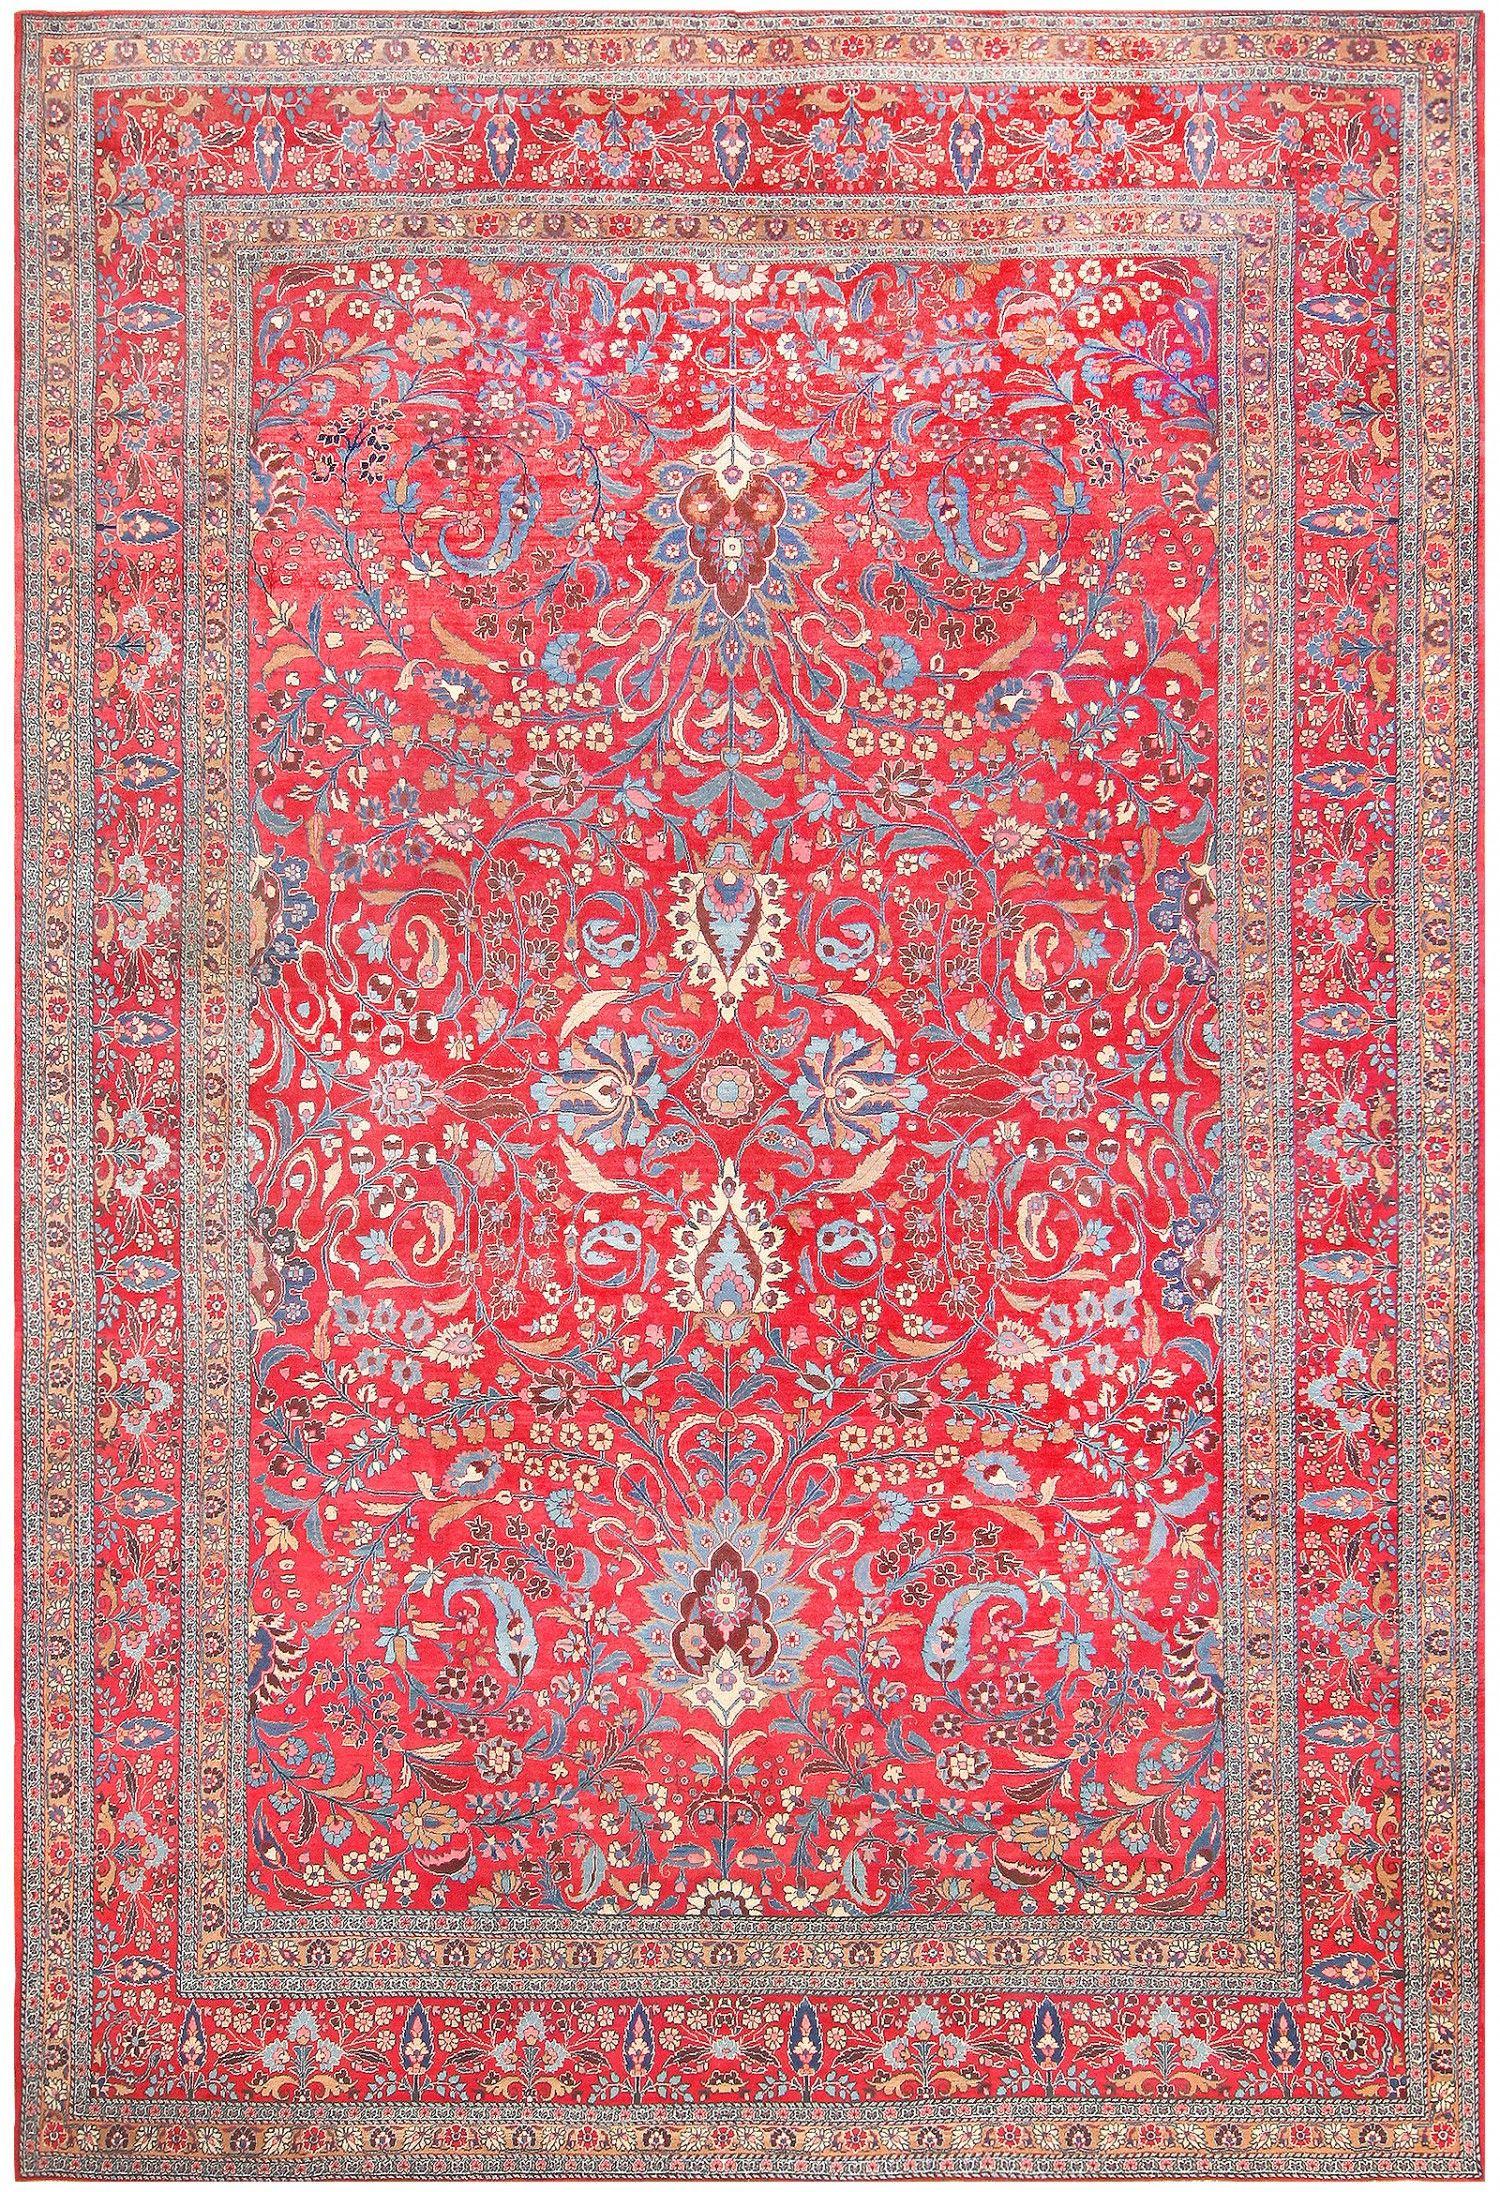 Antique Persian Khoran Carpet 48298